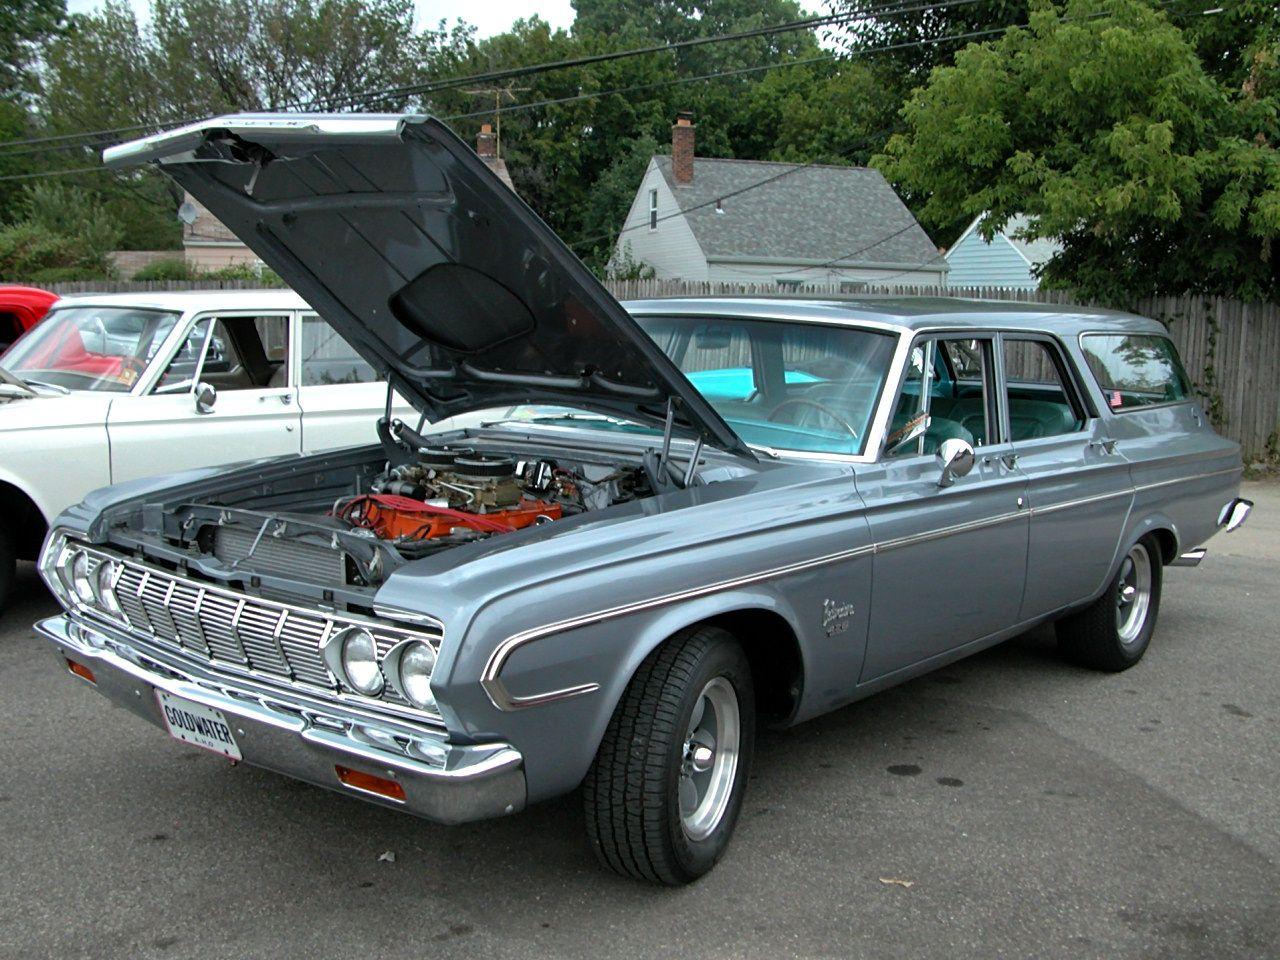 1964 plymouth fury wagon 4door left front